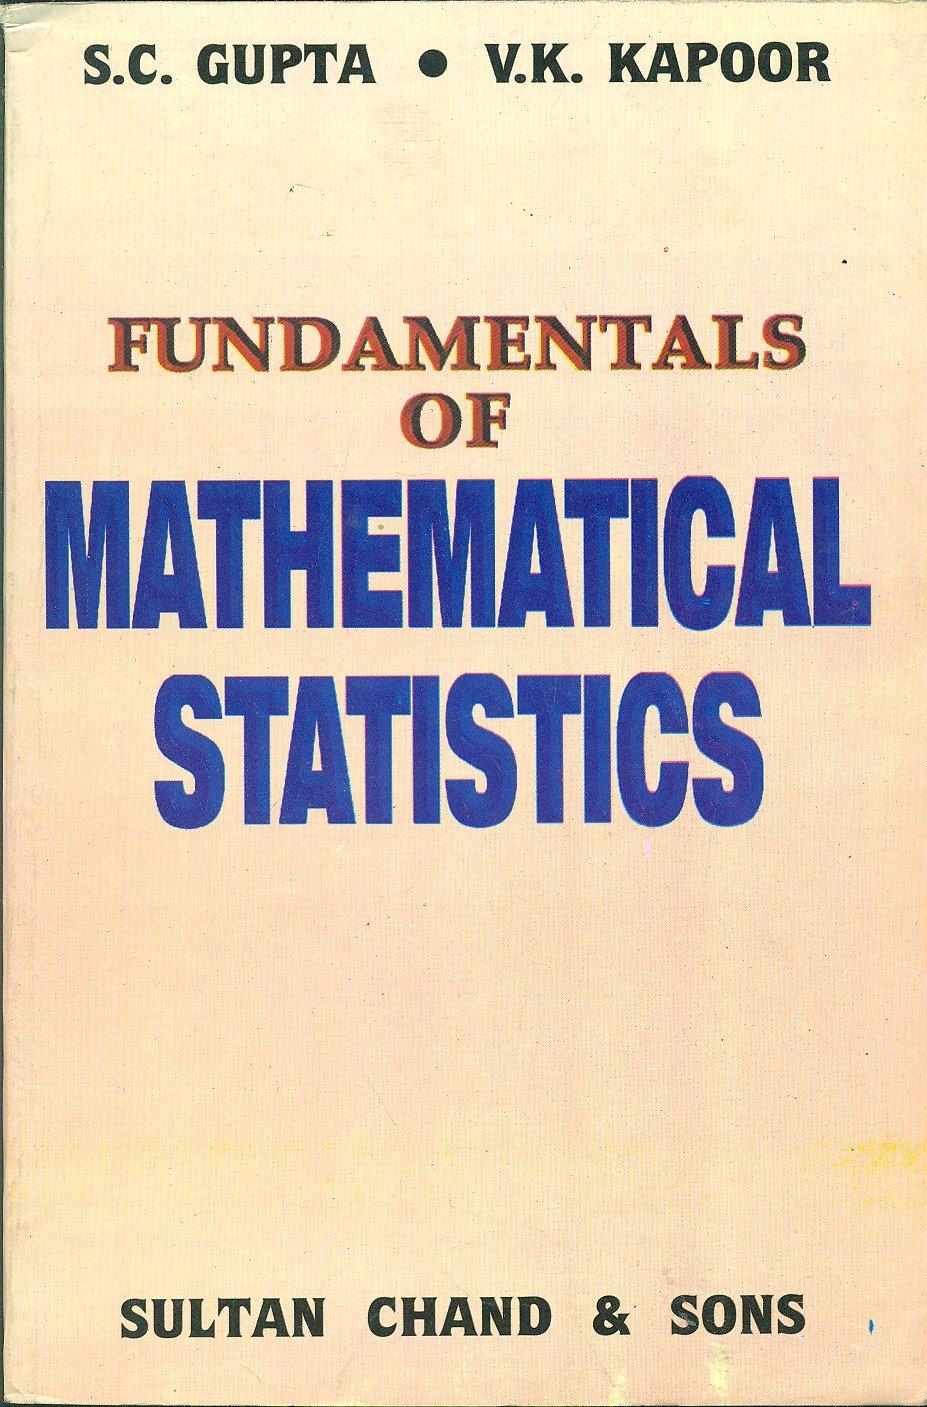 Fundamentals of Mathematical Statistics [PDF] By S.C. Gupta